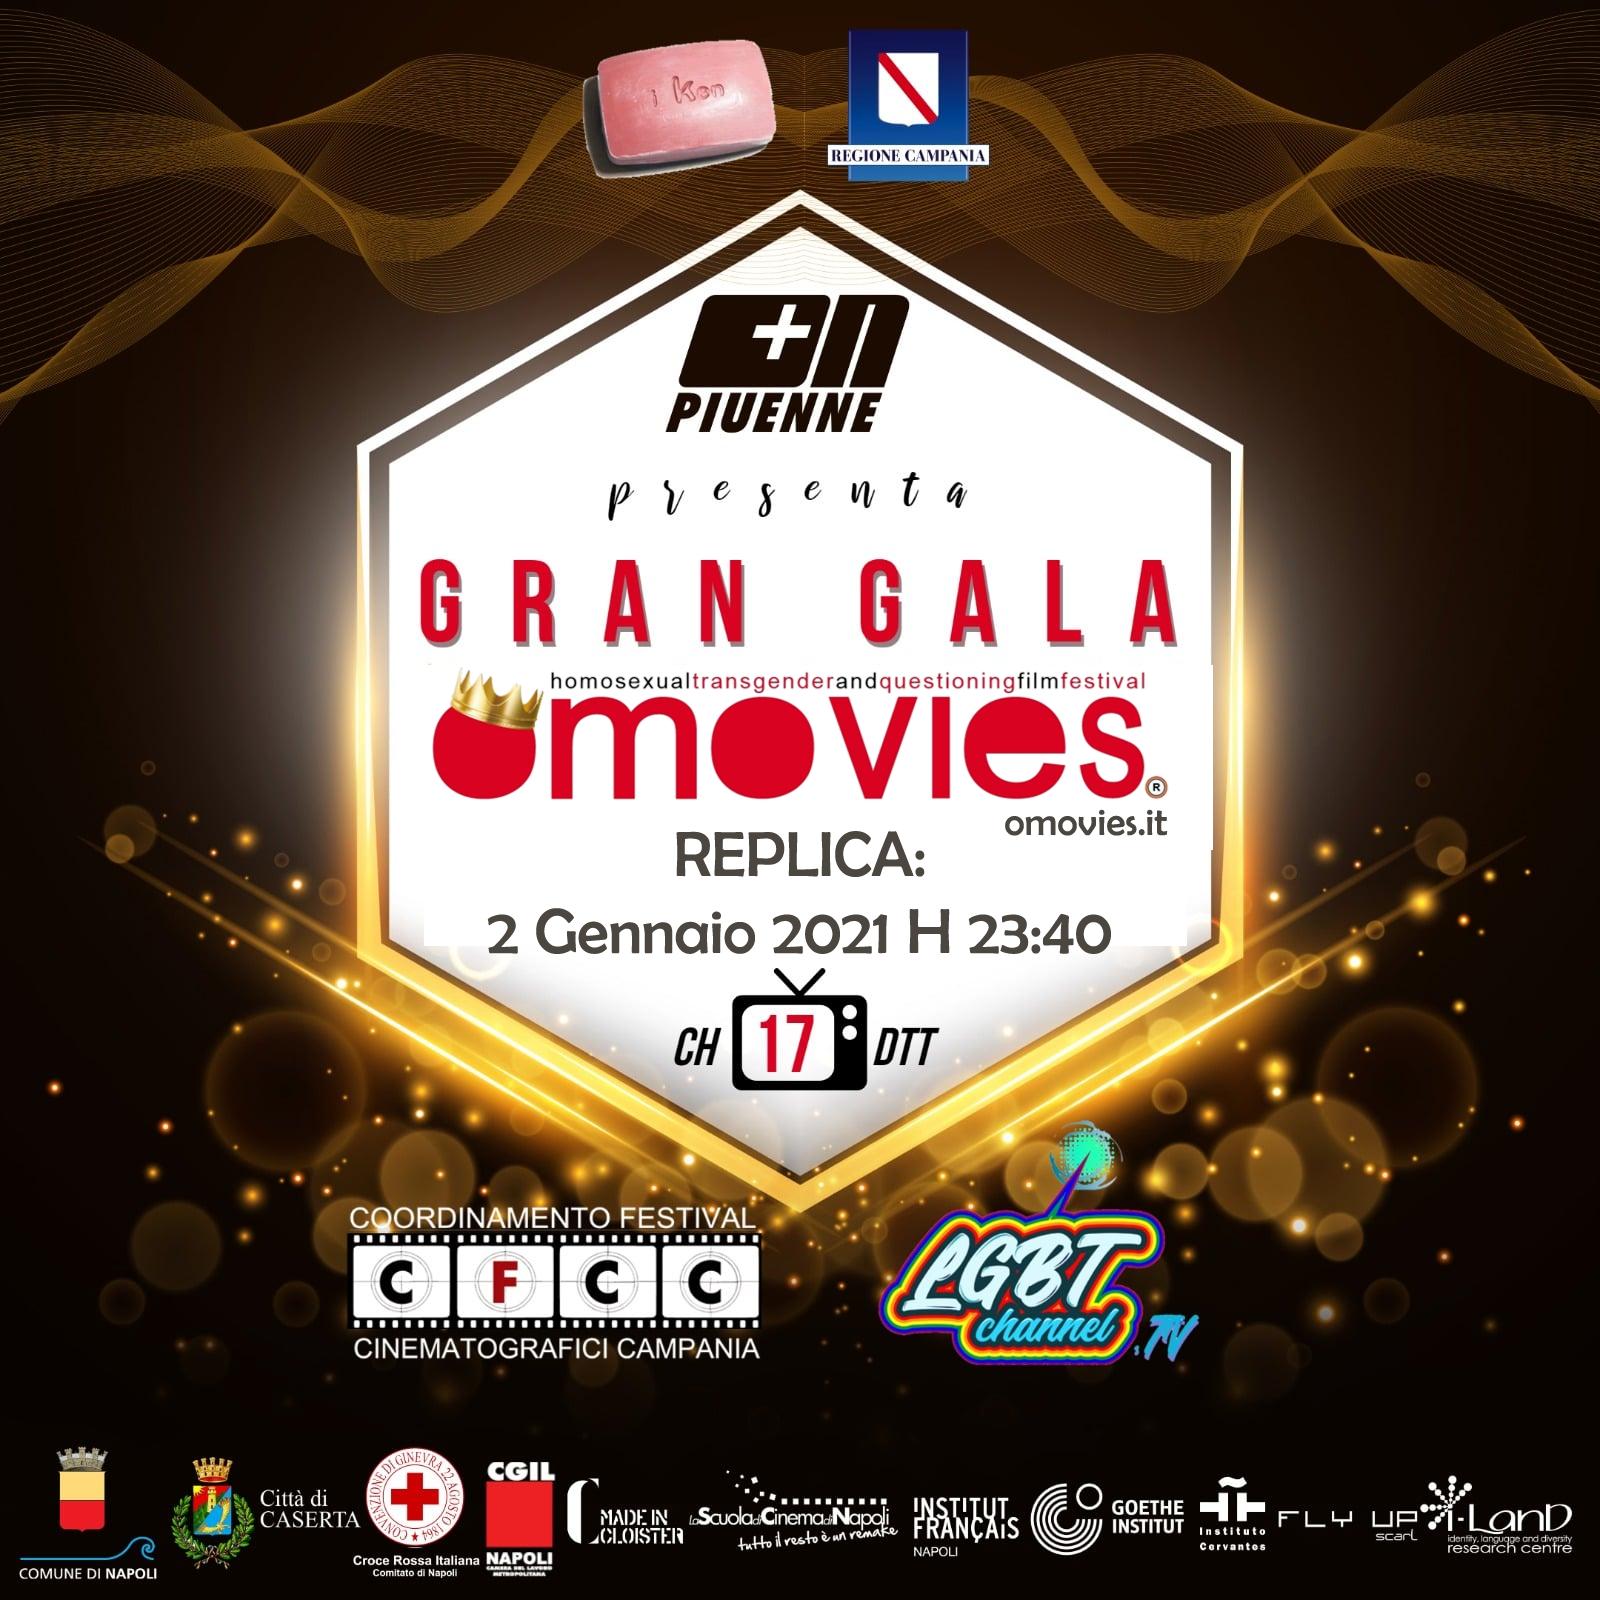 Gran Gala di Omovies – 🏳️🌈 Replica oggi 2 Gennaio 2021 h 23:40 su Piuenne TV